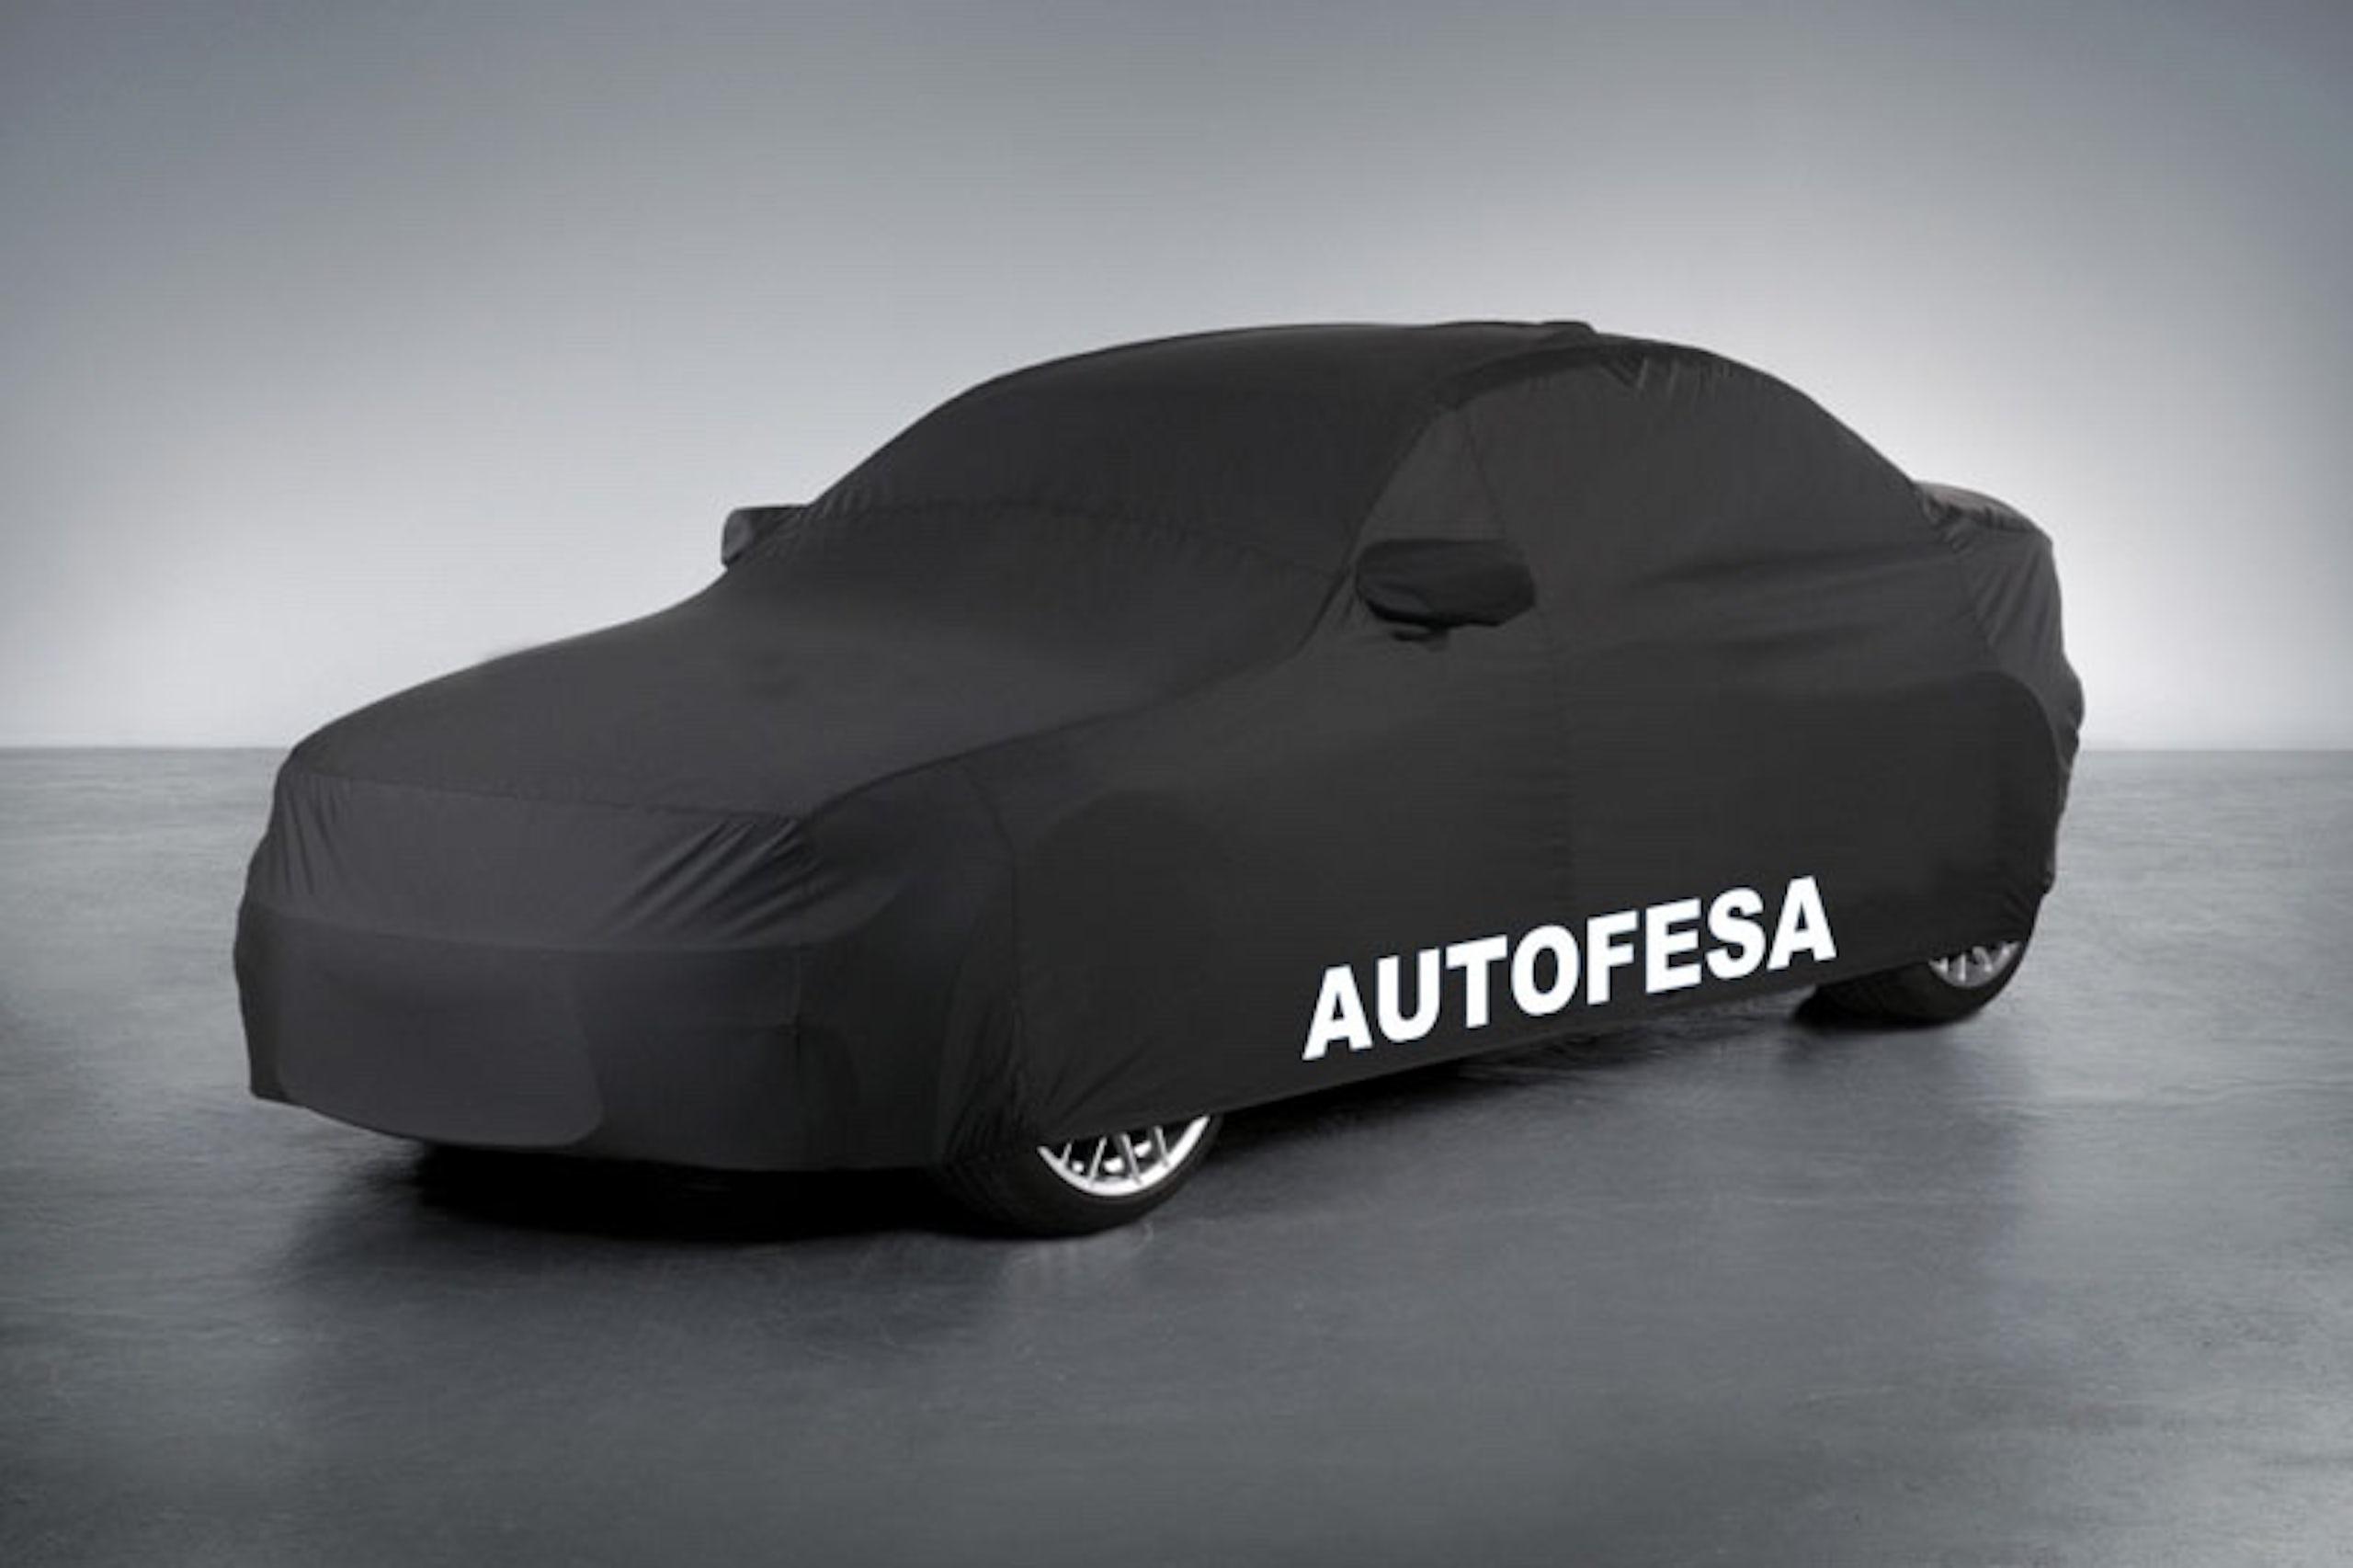 Audi Q5 2.0 TDI 170cv quattro 5p S tronic Auto - Foto 5